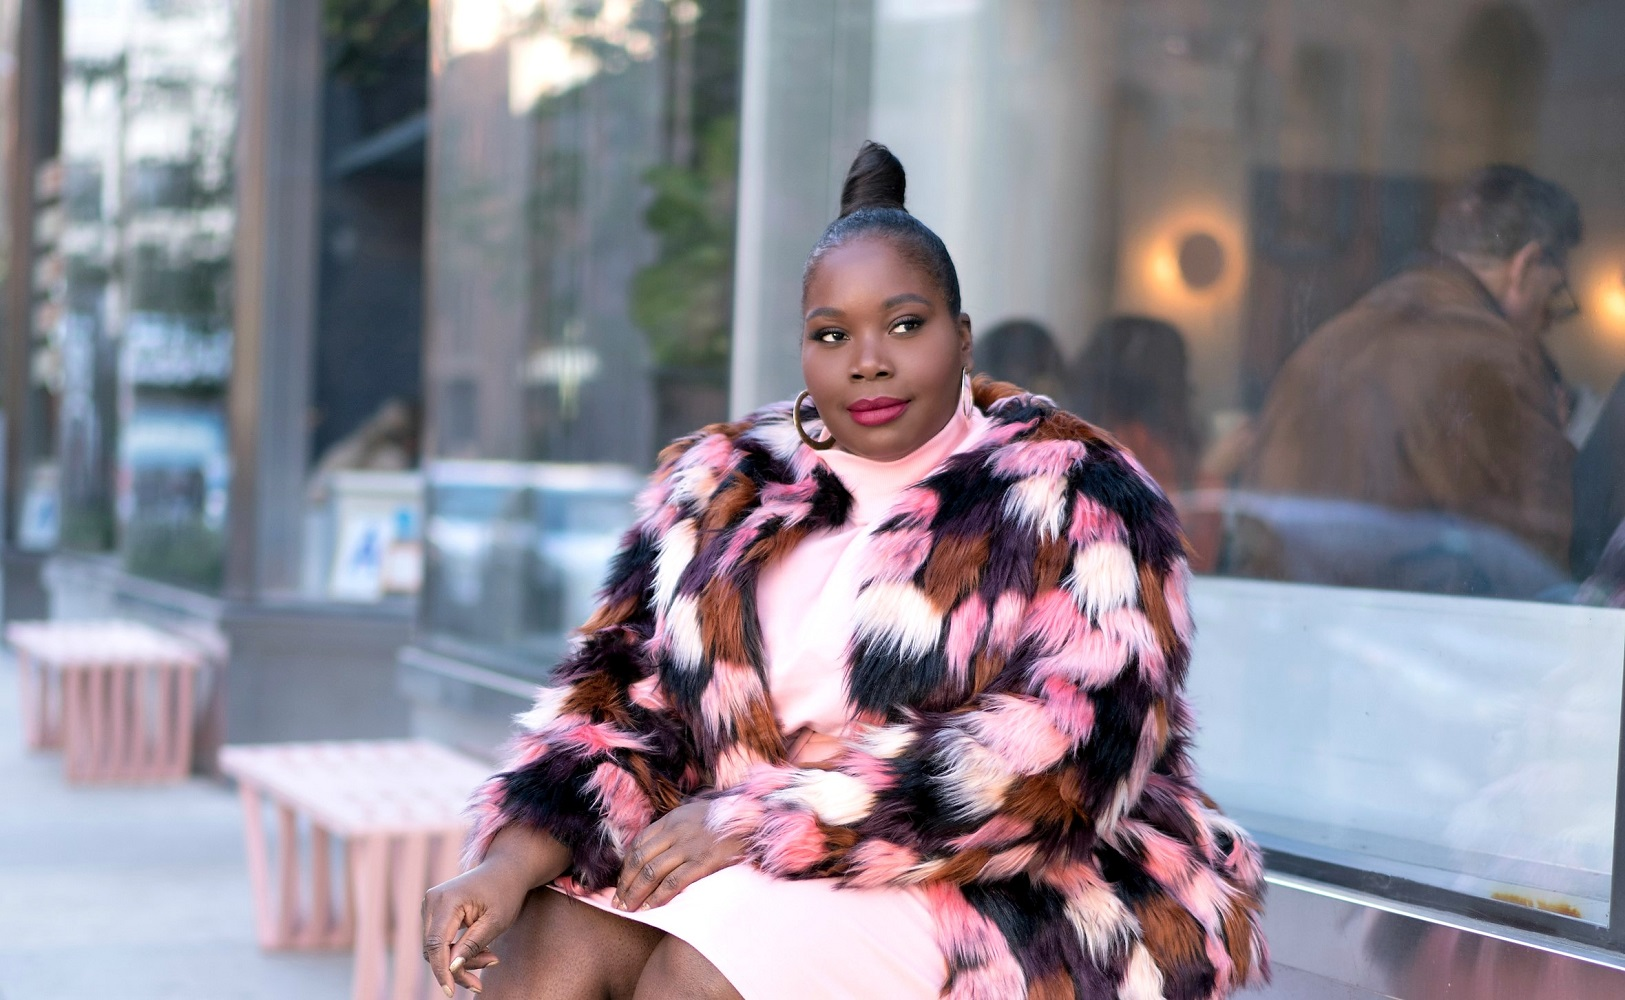 55851fa80cbd Outfit Inspiration  Faux Fur Coats   Sweater Dresses